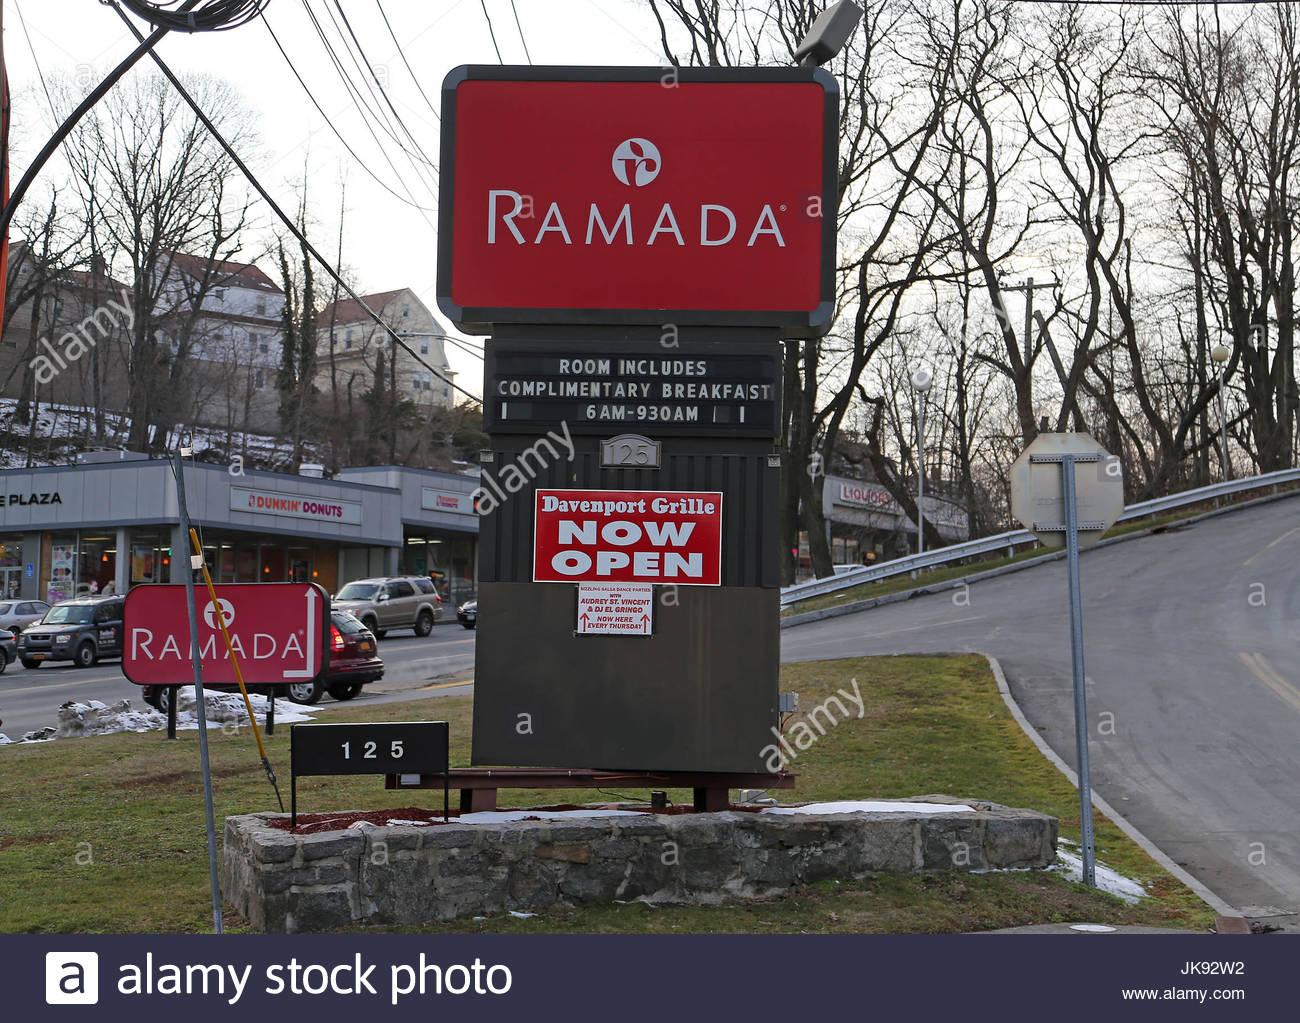 Dmx Ramada Inn Yonkers Yonkers Ramada Inn Parking Lot Where